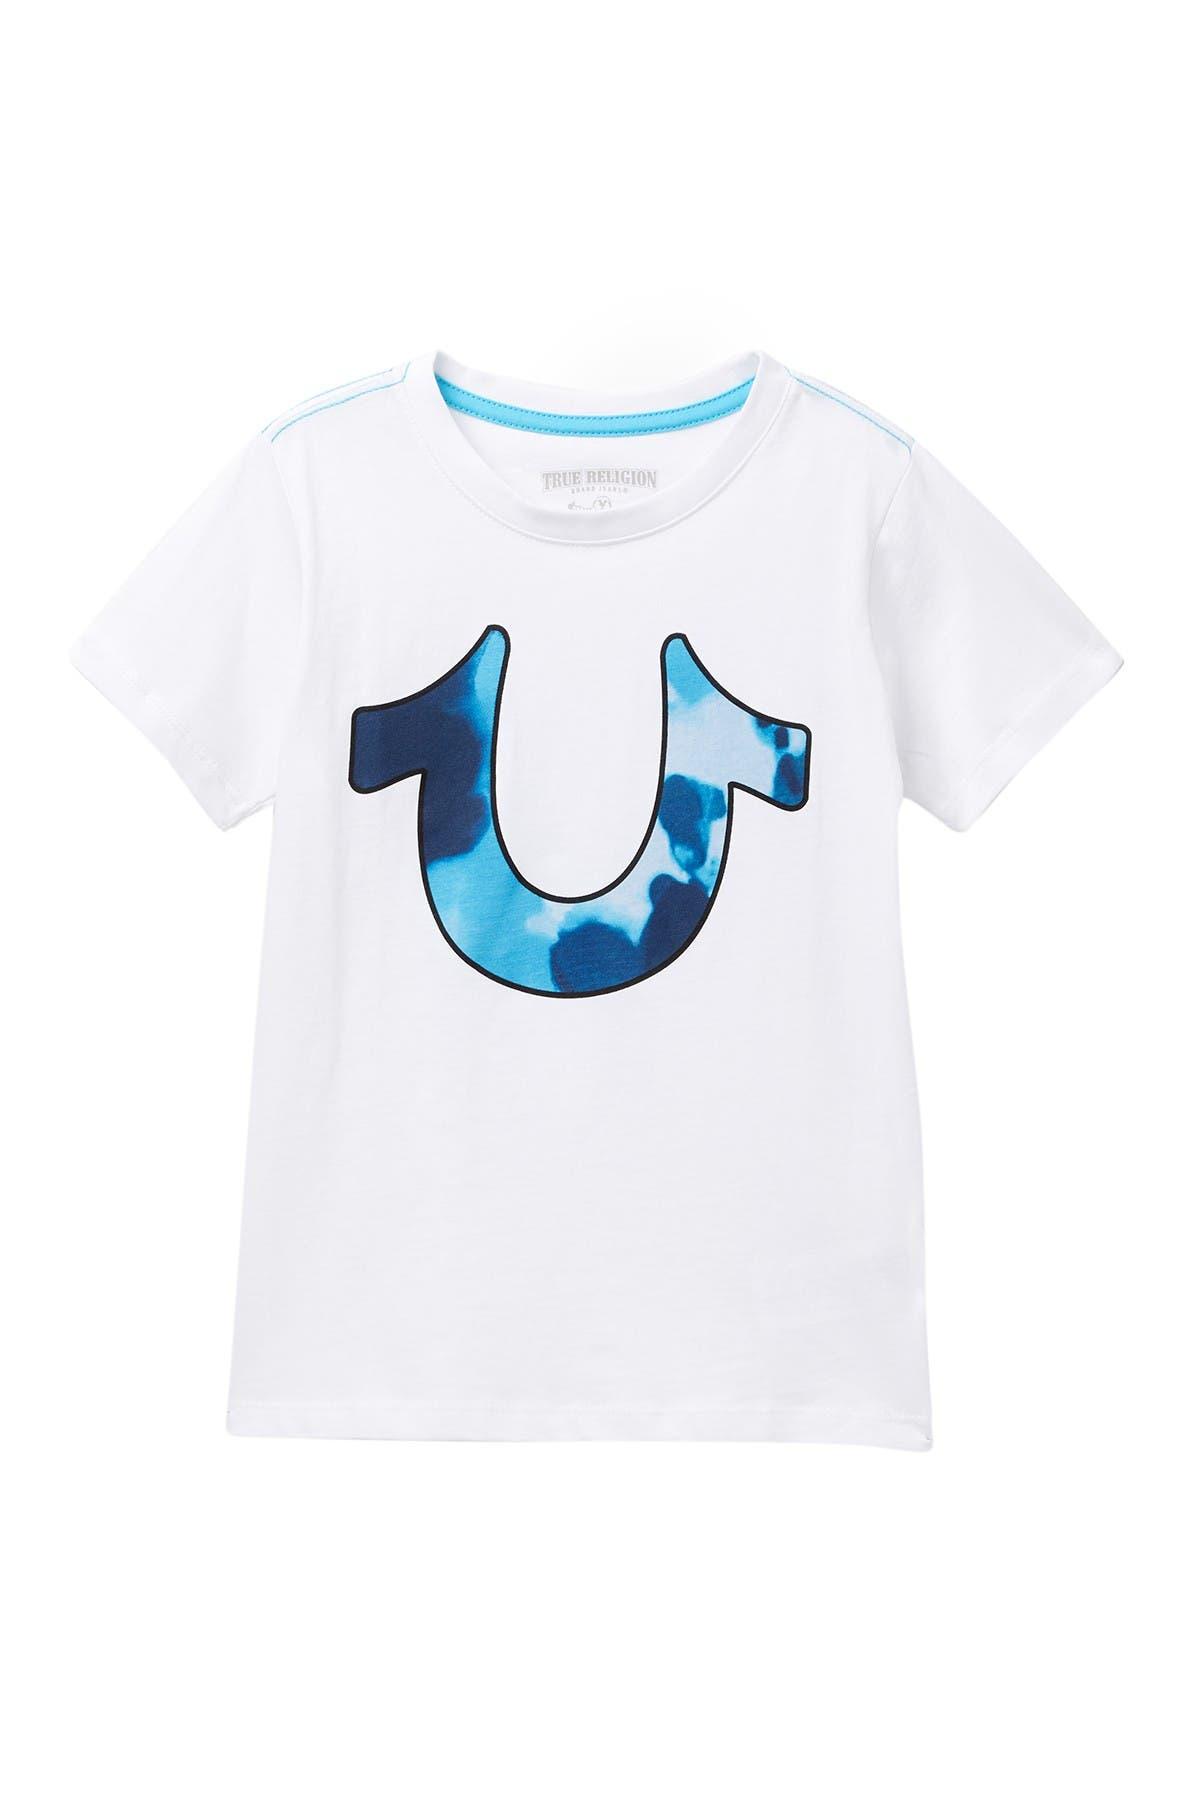 Image of True Religion Tie Dye Horse Shoe T-Shirt